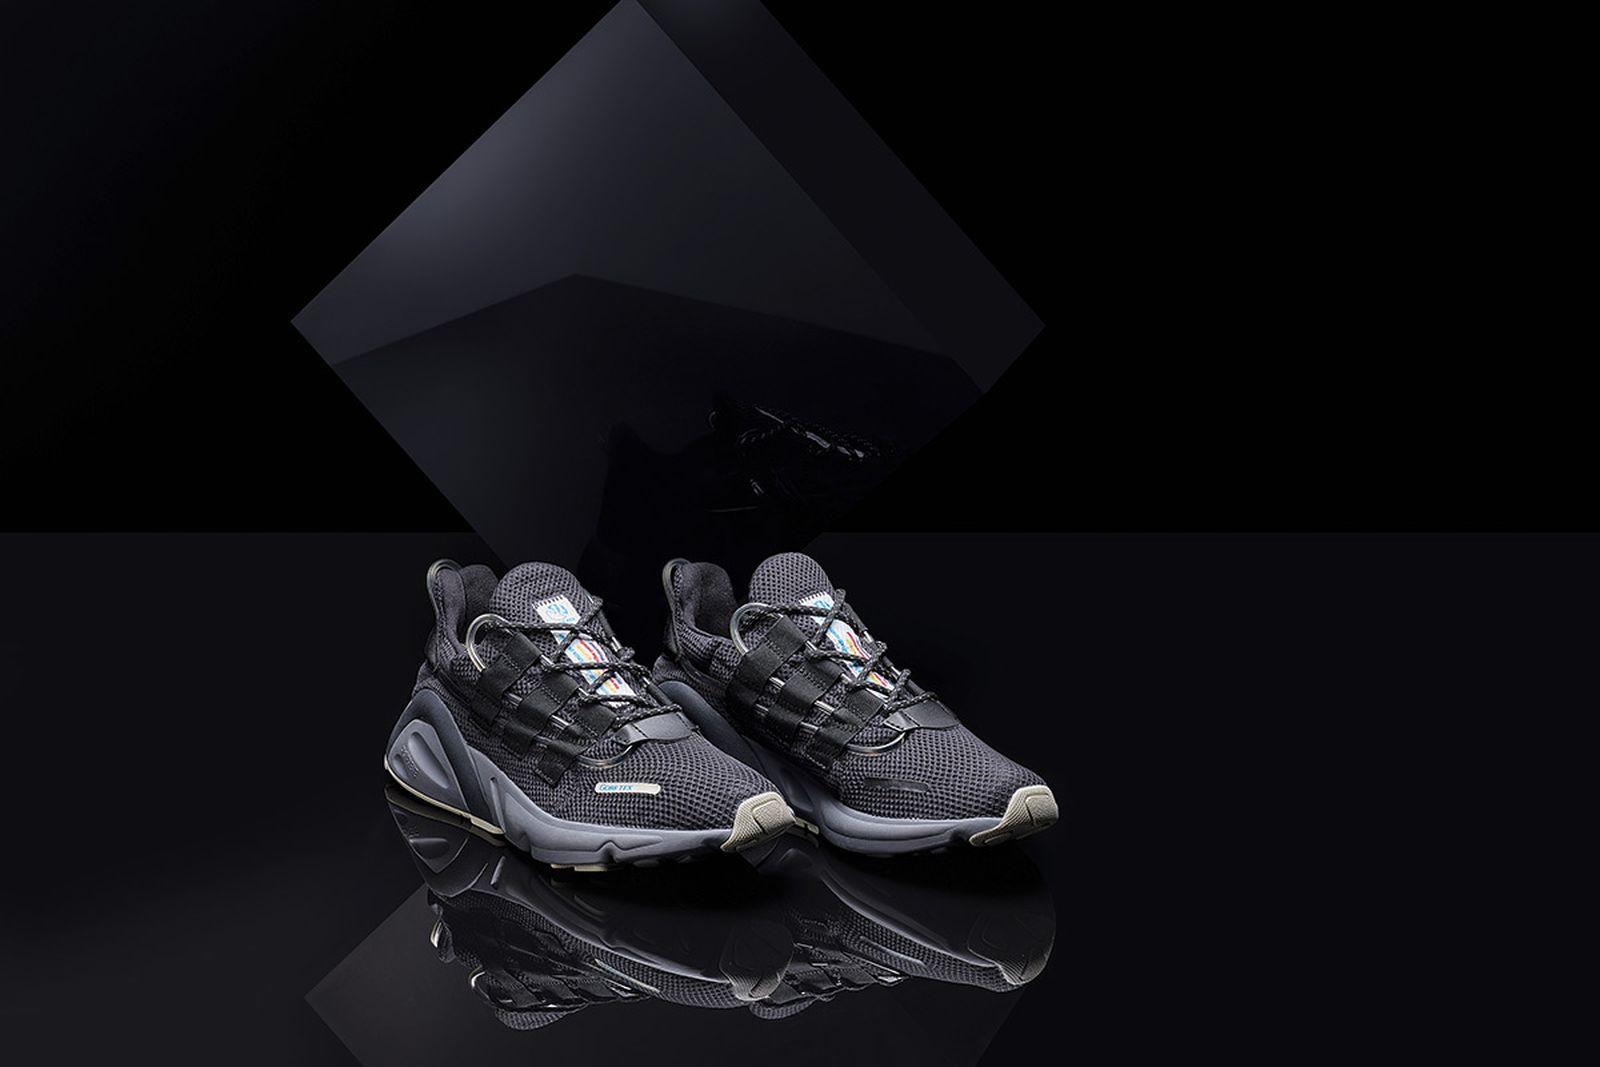 prestar pedir Bandido  This GORE-TEX x adidas LXCON Future Is for Friends & Family Only